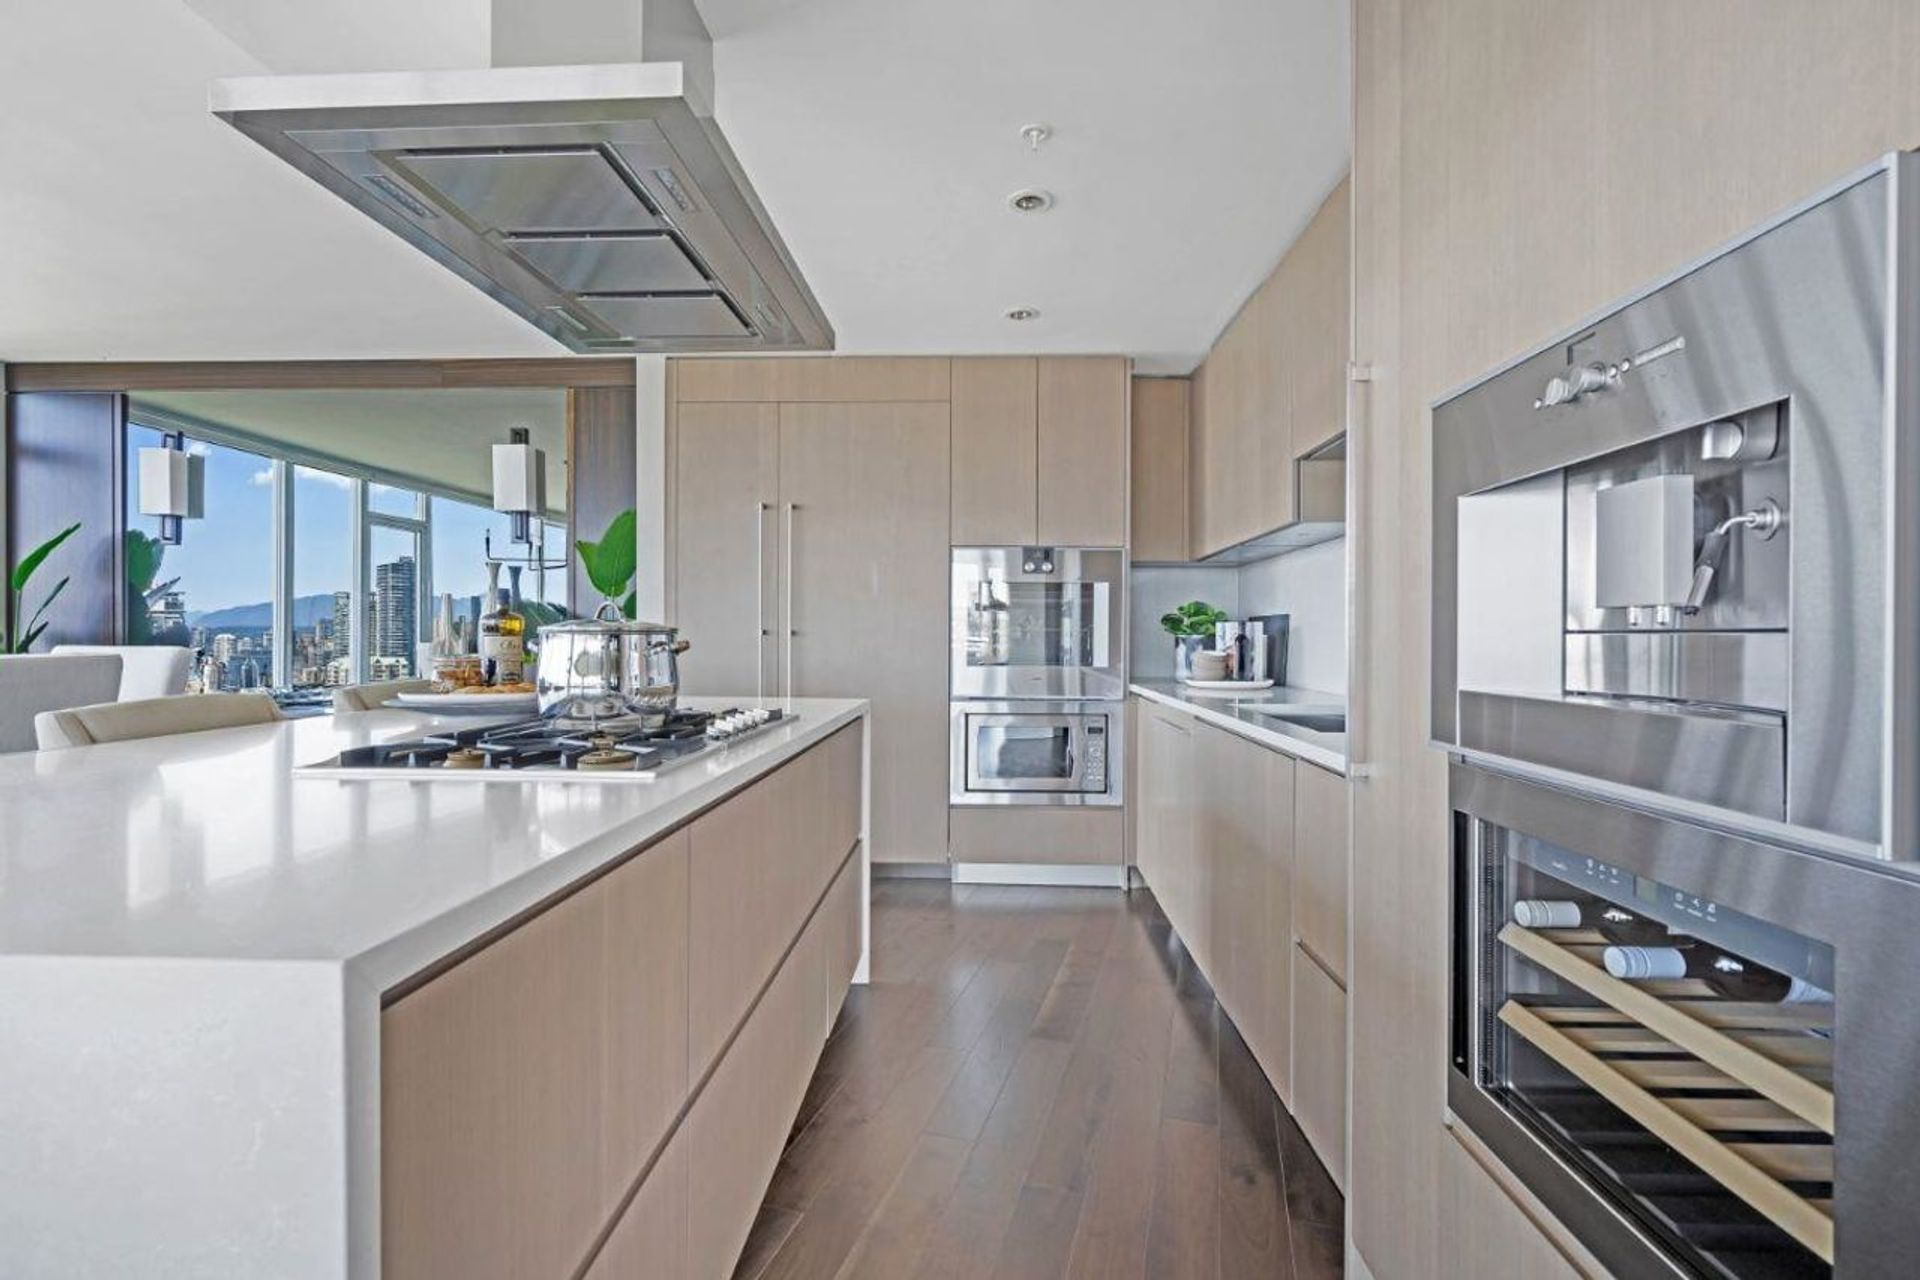 210-salter-street-queensborough-new-westminster-08 at 2103 - 210 Salter Street, Queensborough, New Westminster